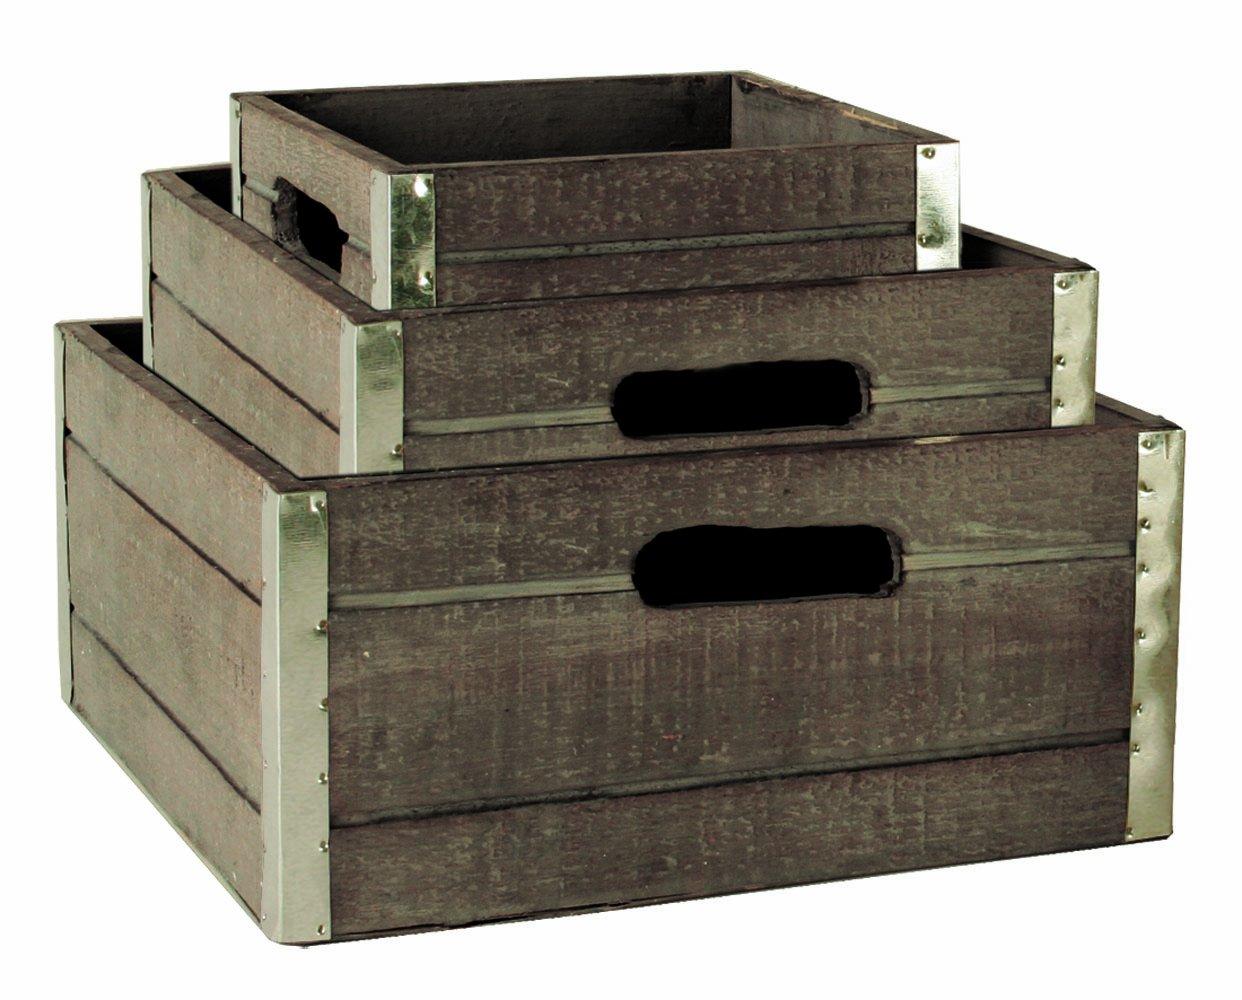 Wood Crates with Galvanized Metal Trim